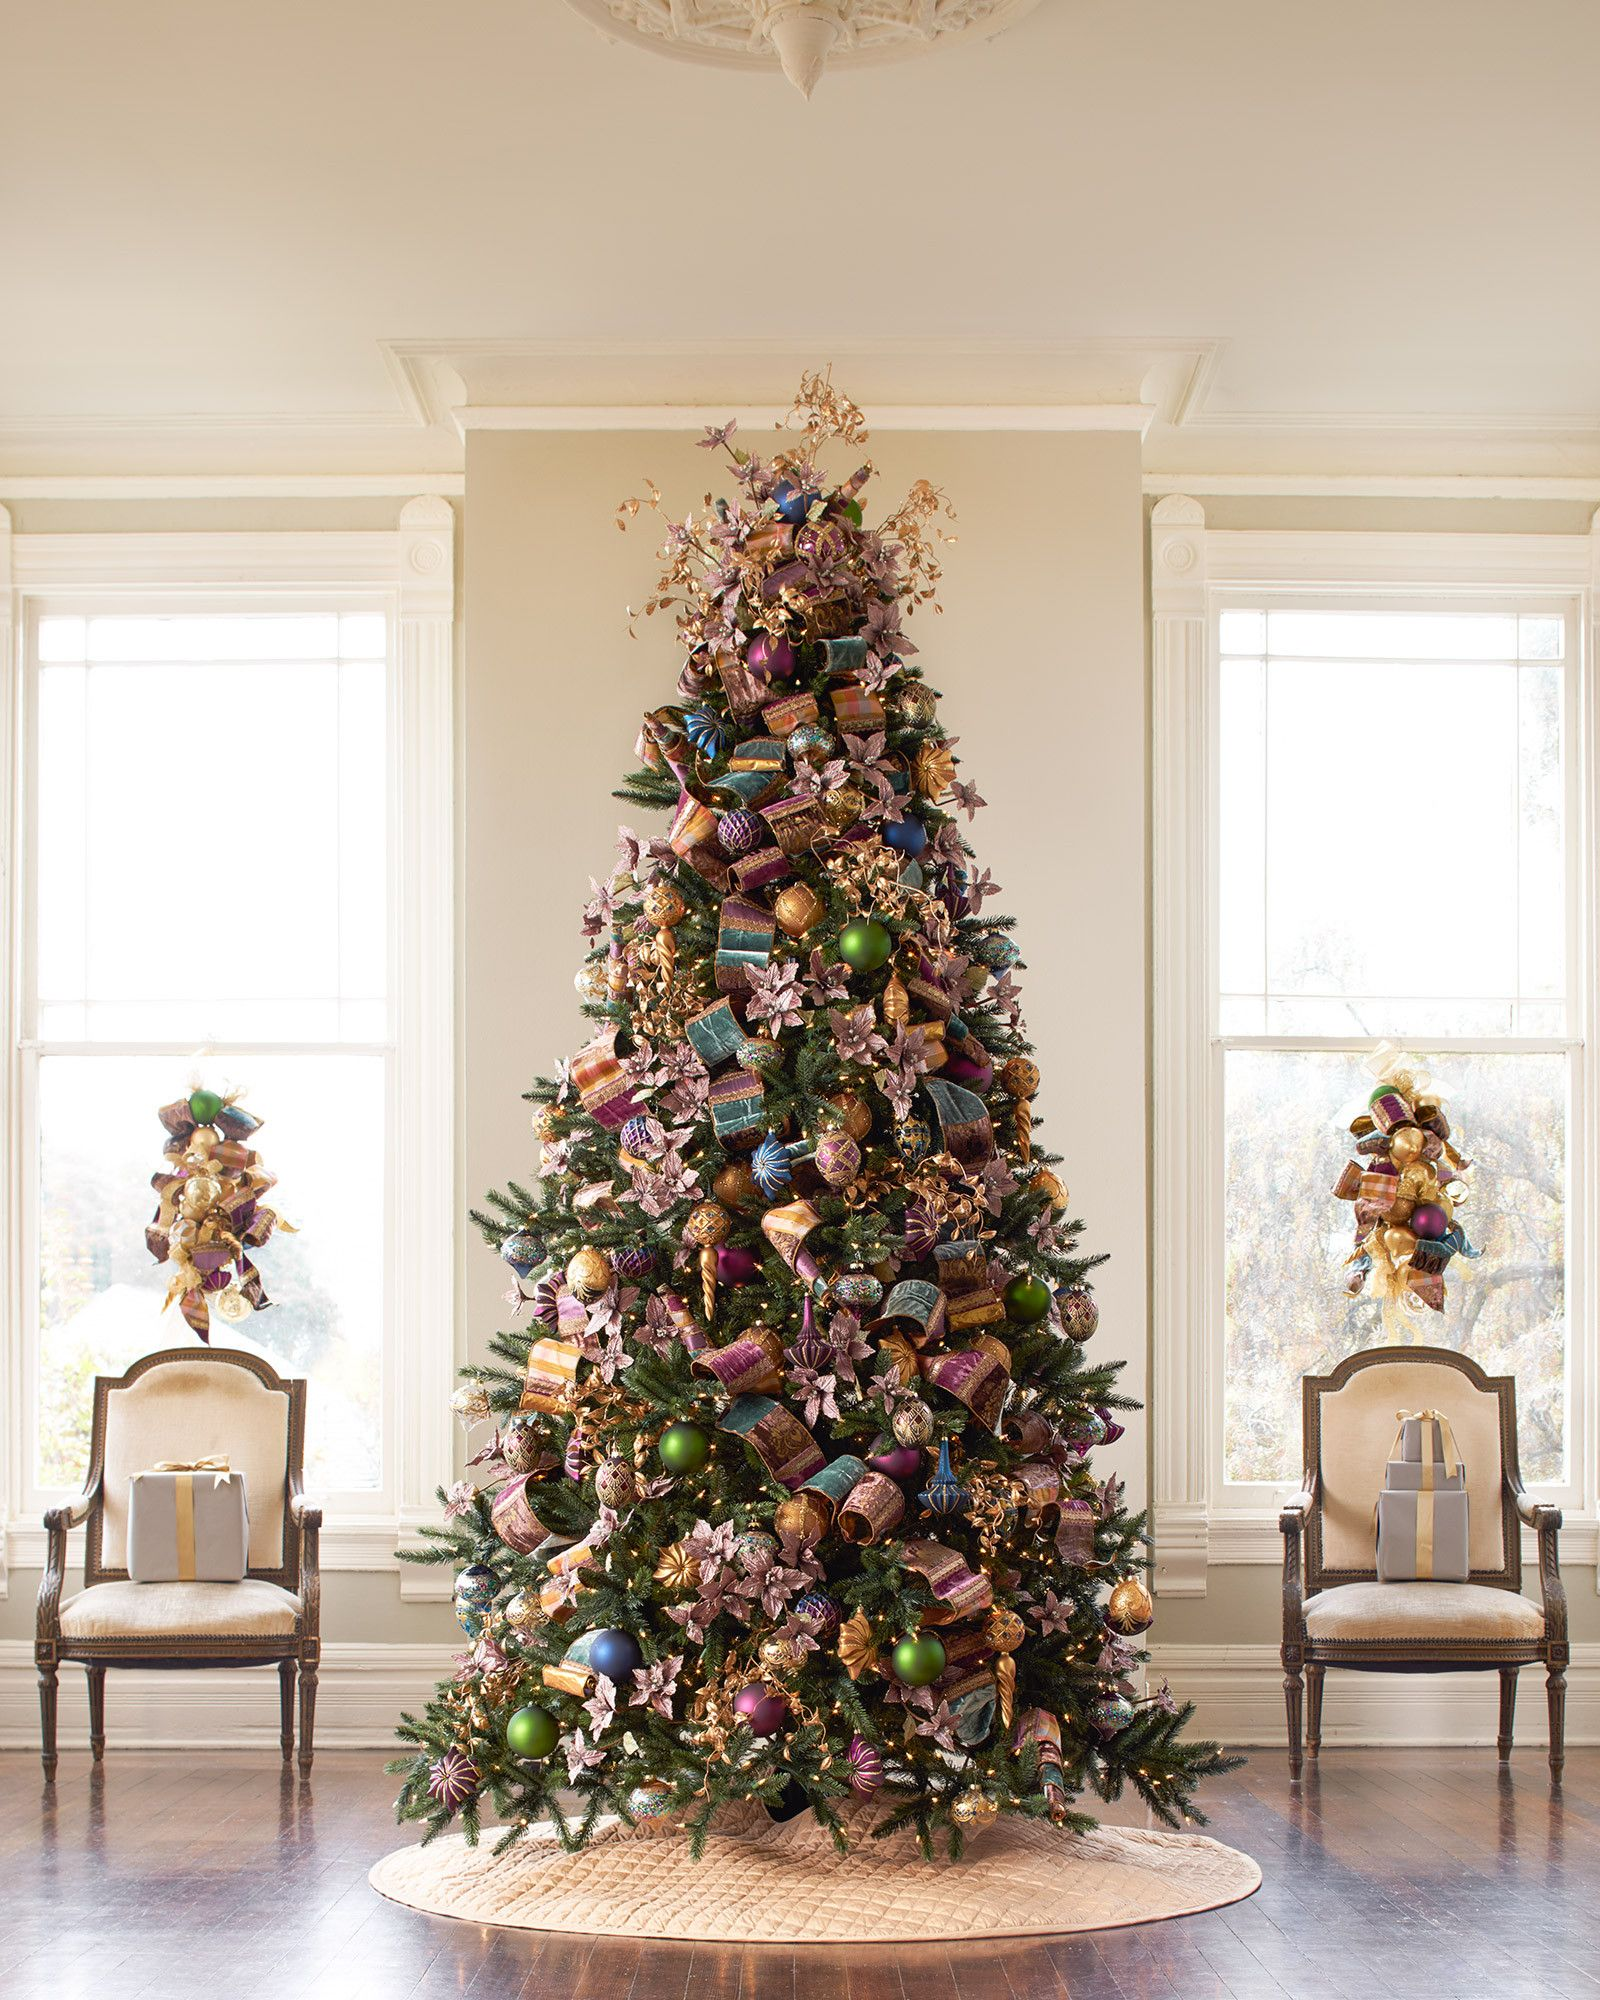 BBR T 10?u=jlnpkv&q=70 california baby redwood artificial christmas tree balsam hill pre lit tree wiring diagram at reclaimingppi.co